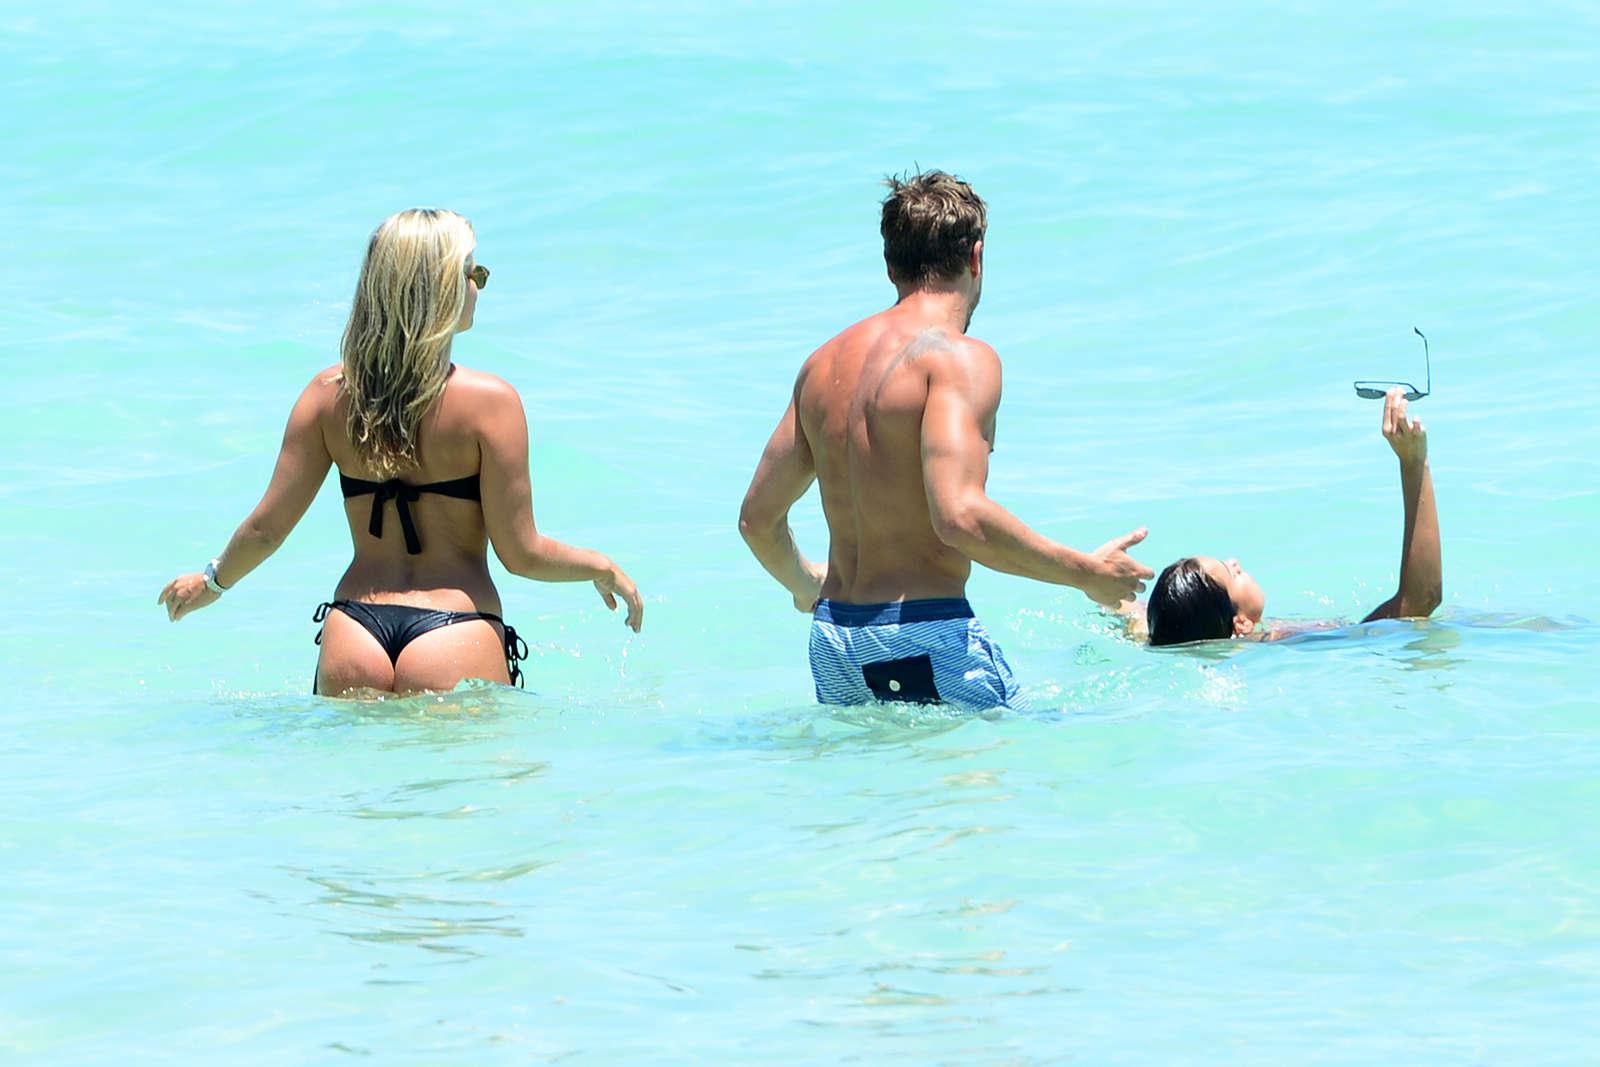 Natasha Oakley and Devin Brugman in Bikini on vacation in Miami